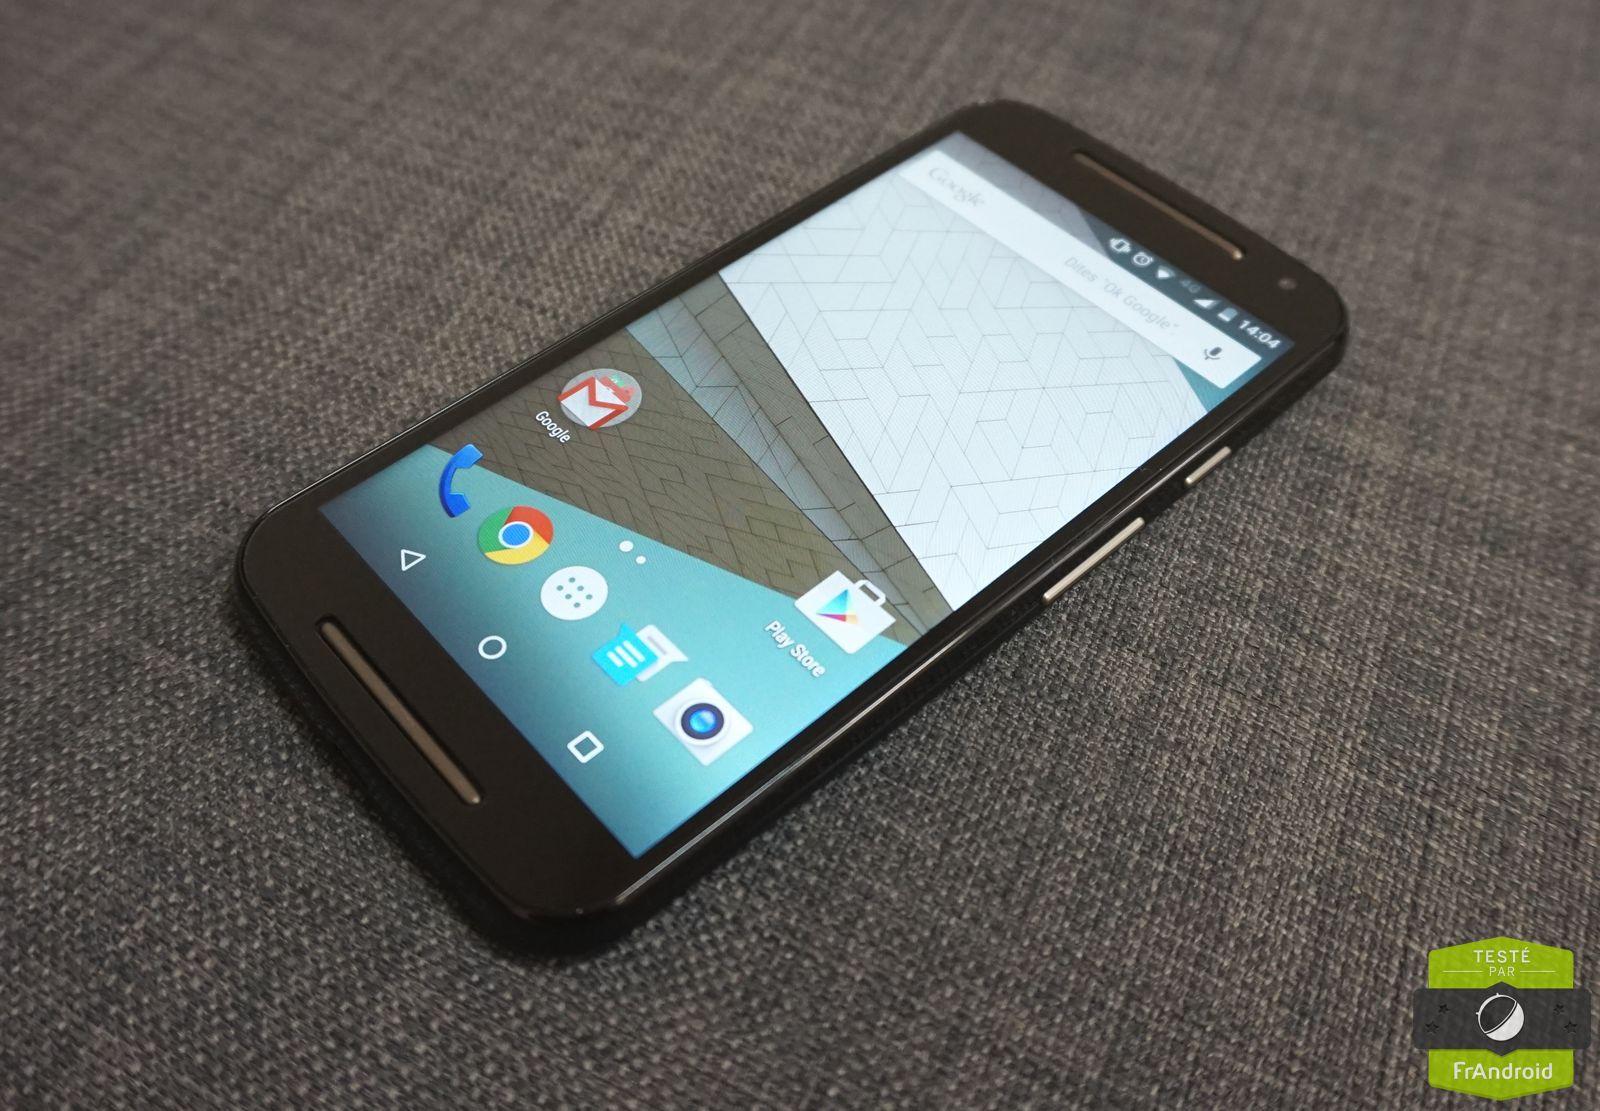 Test du Moto G 4G (2e Gen.) : 6 mois de retard inexcusables